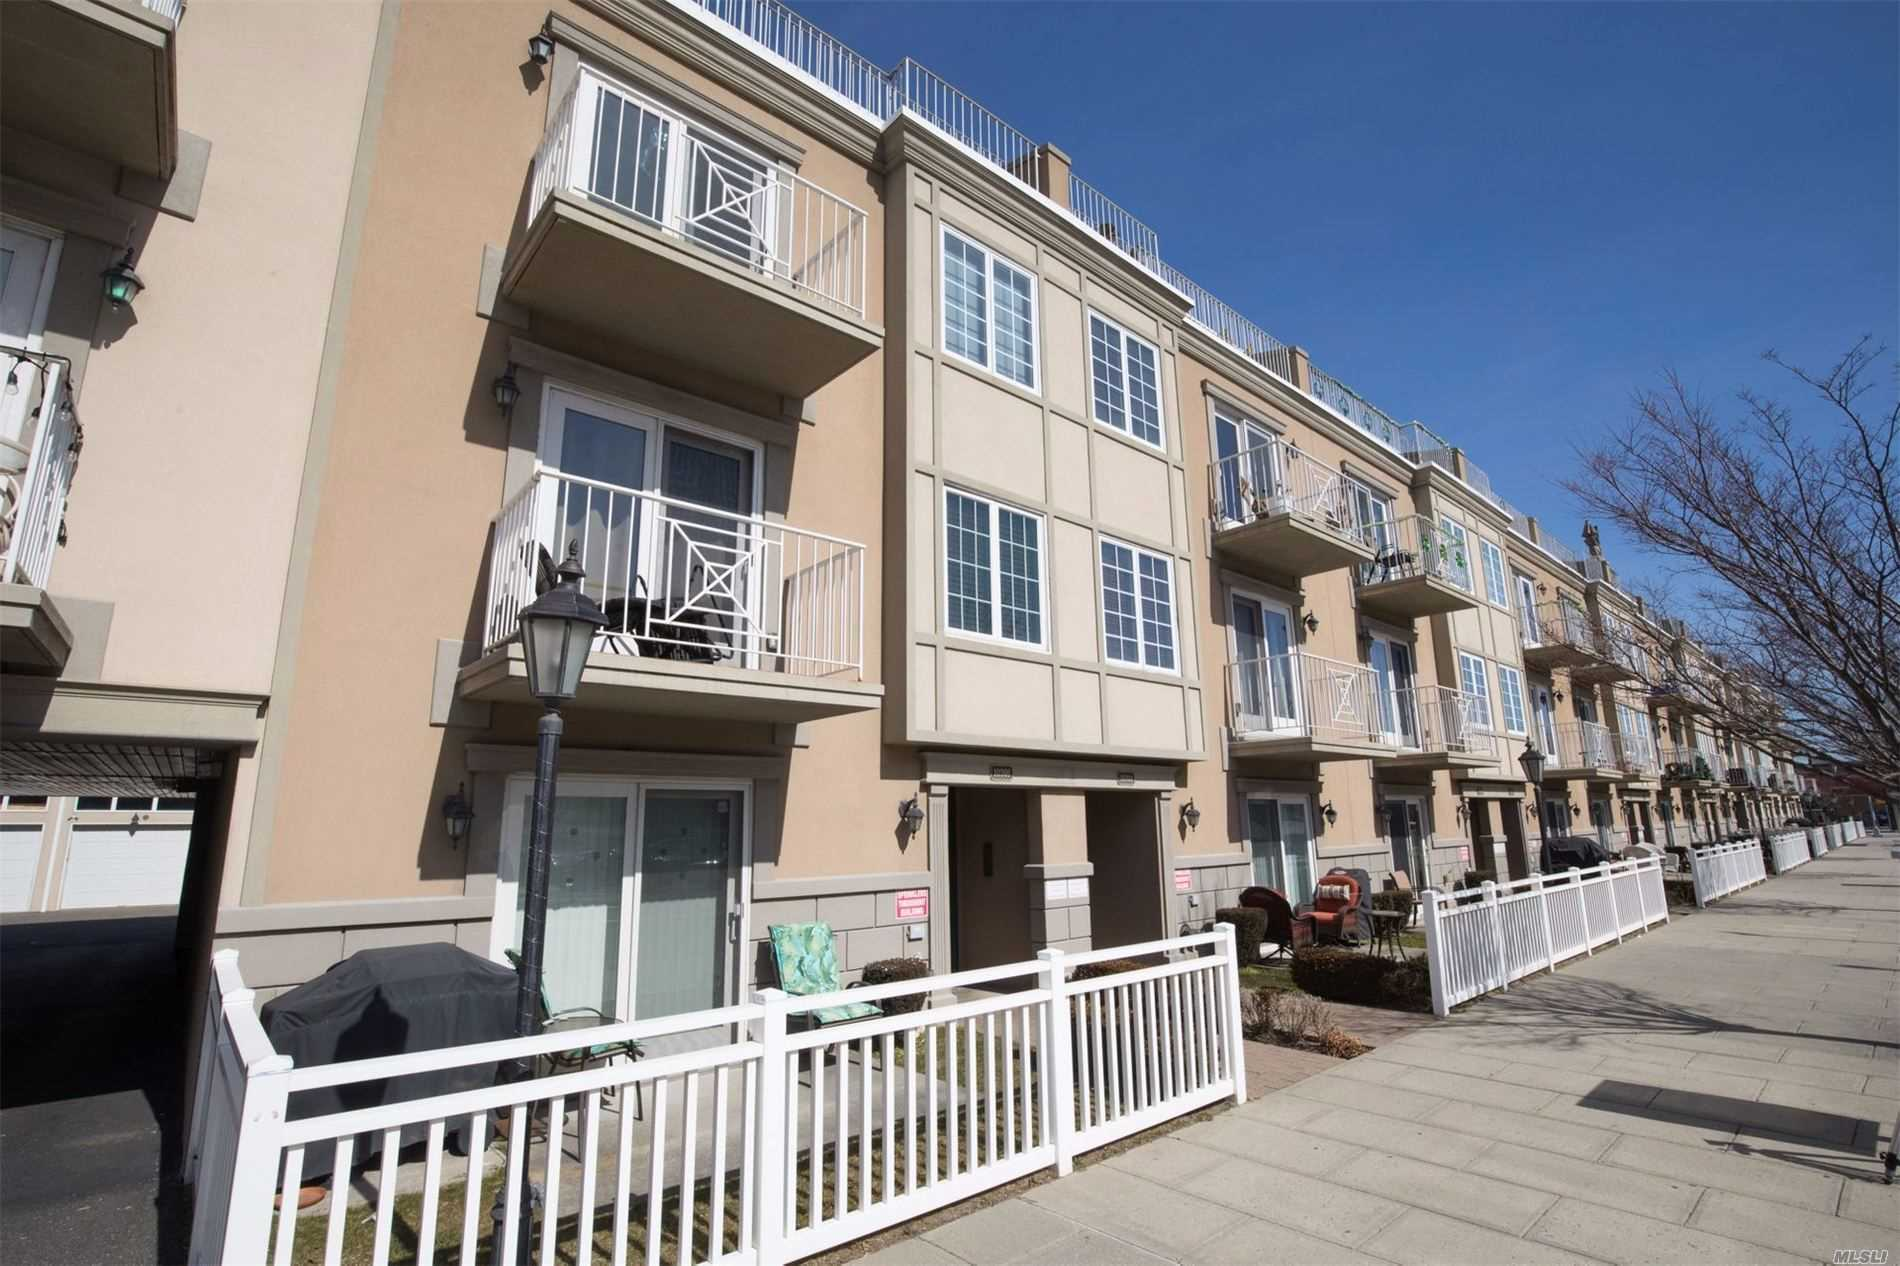 Property for sale at 102-06 Rockaway Beach B # 3C, Rockaway Park NY 11694, Rockaway Park,  New York 11694